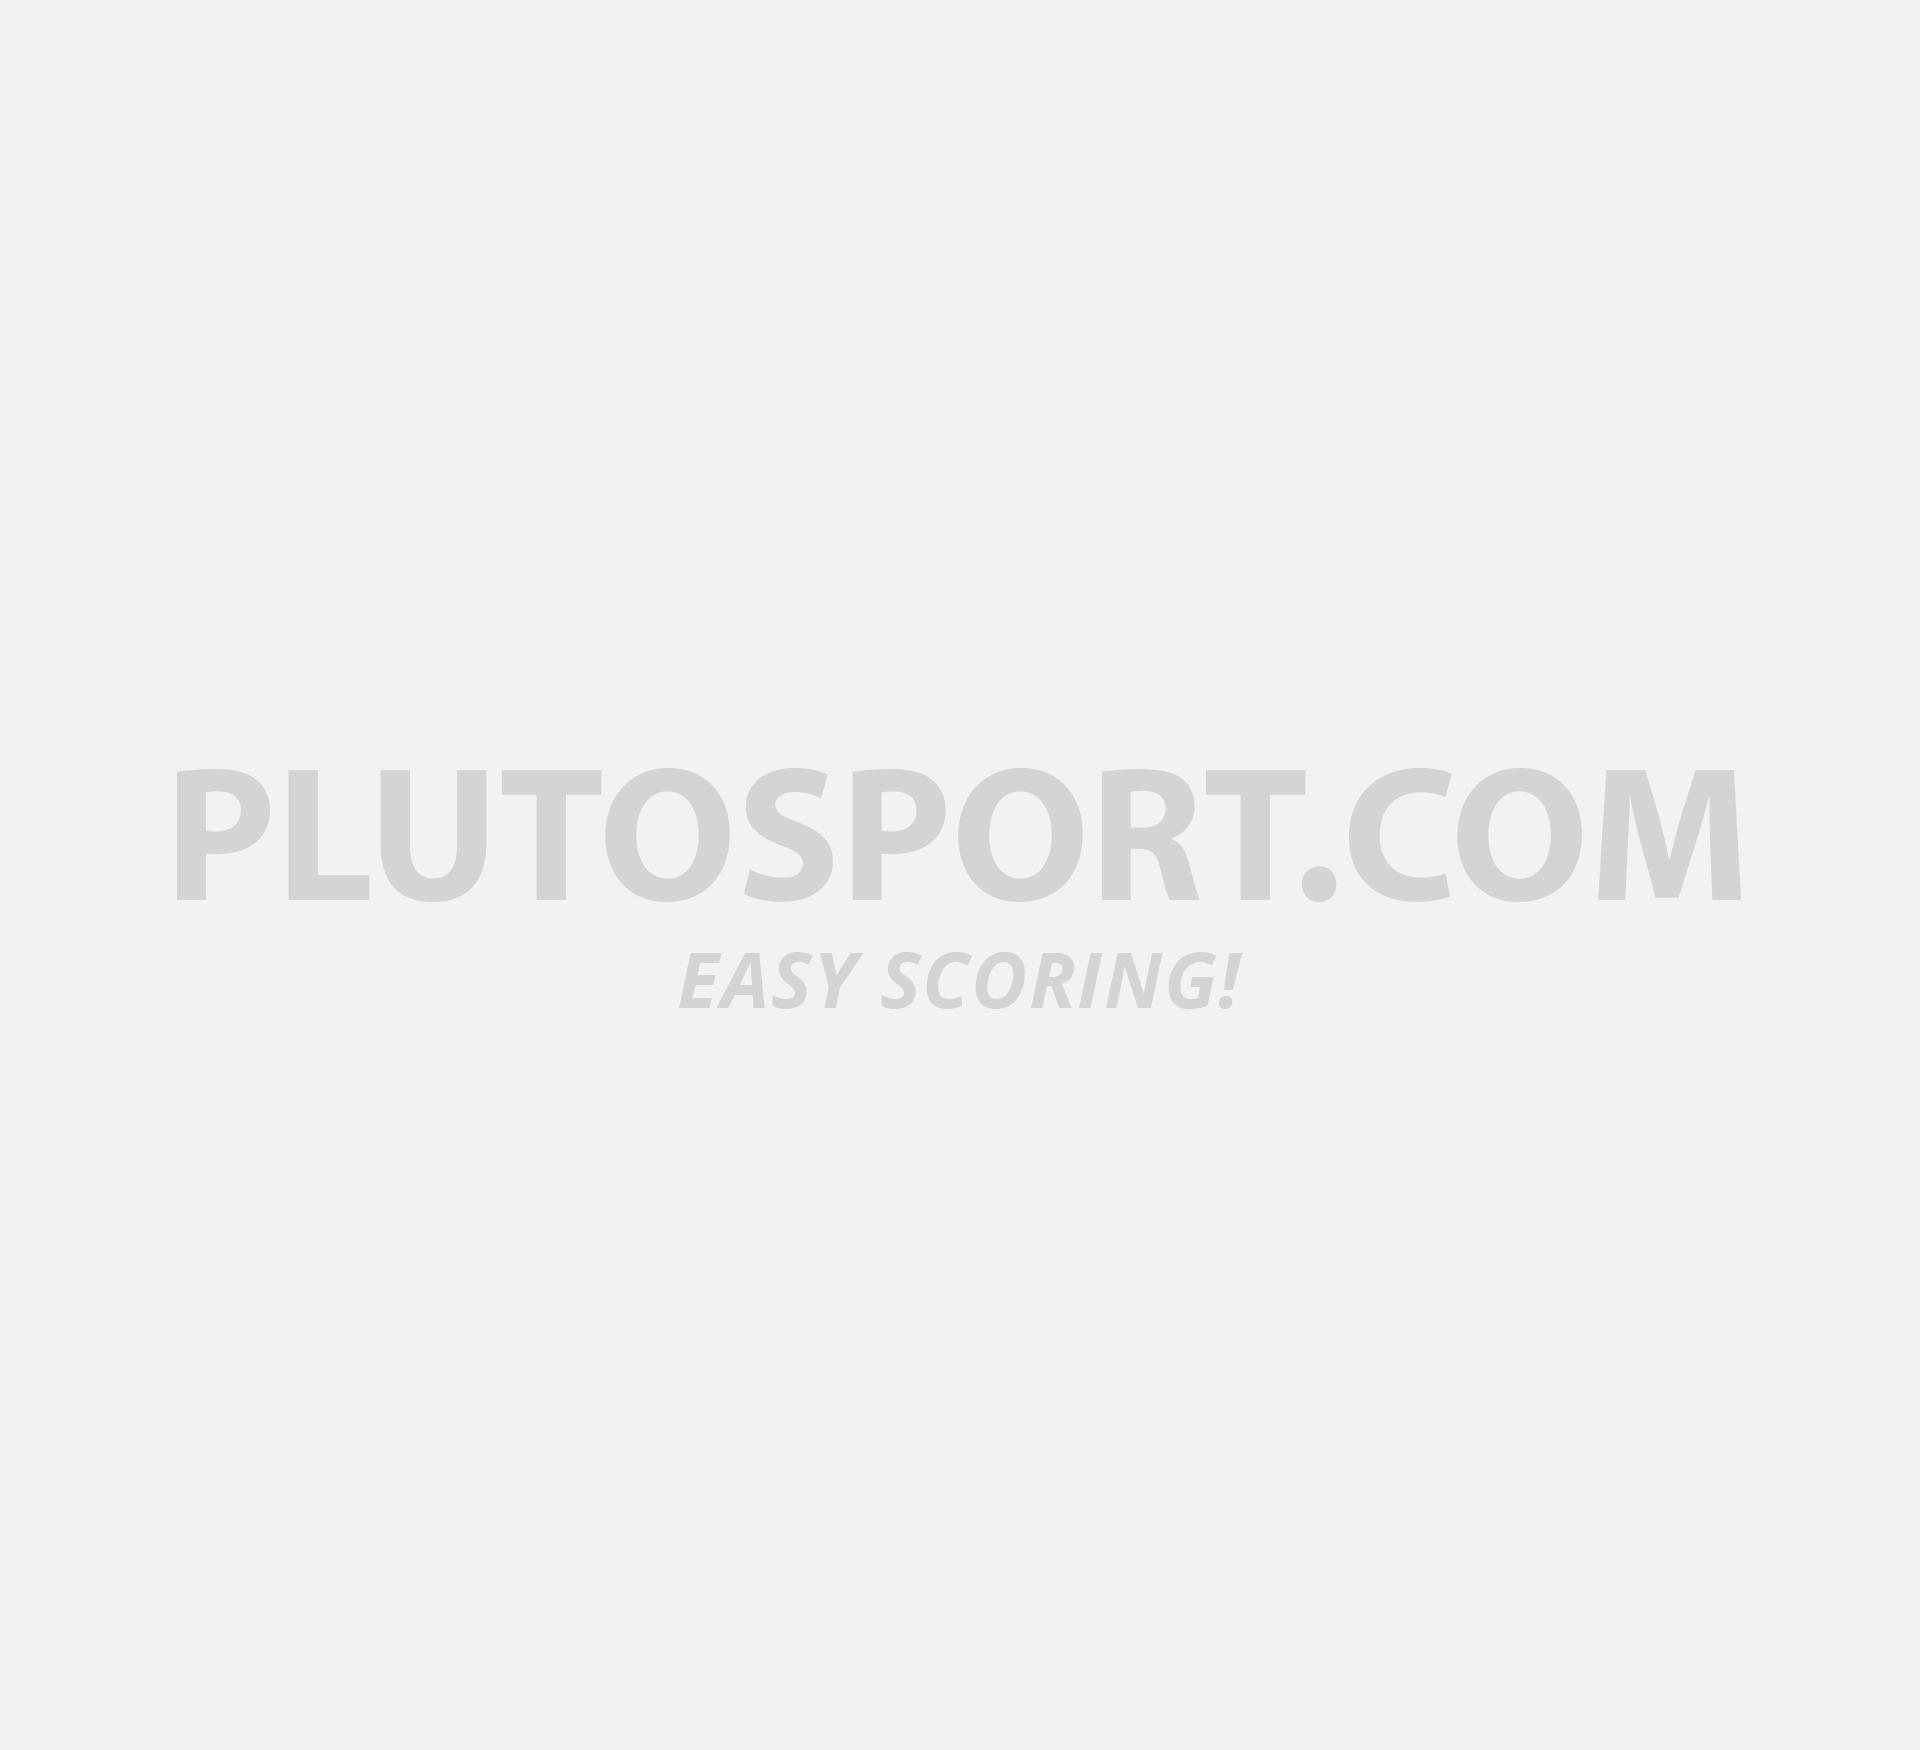 Recepción hostilidad artería  Asics Gel-Hunter 2 Indoorshoes Women - Shoes - Volleyball - Sports |  Plutosport